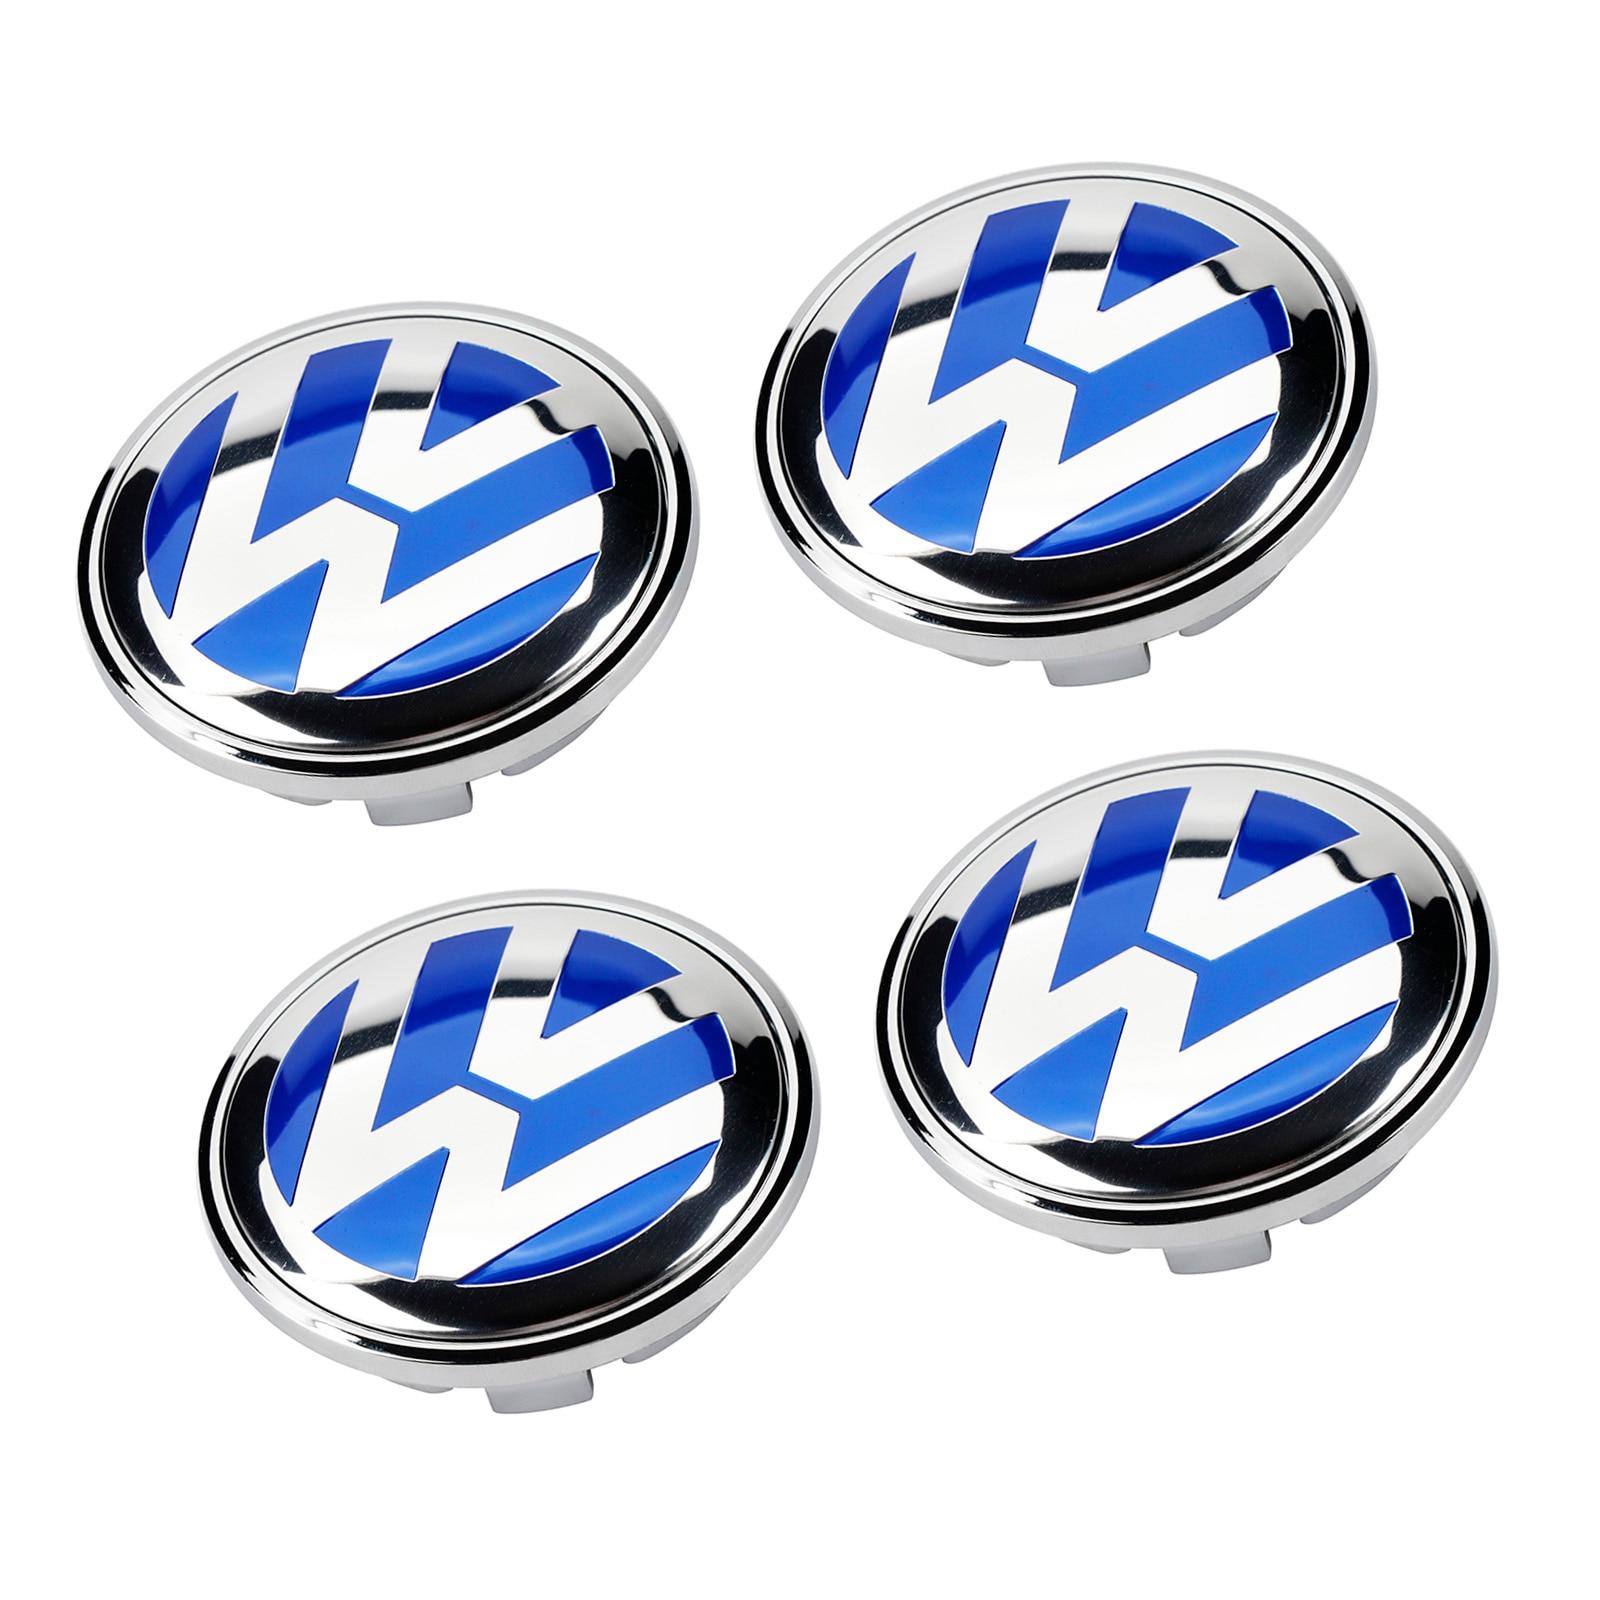 4 pçs/set Azul 65mm 3B7 601 171 Tampa Do Cubo Da Roda Cap Centro Logo Emblema Emblema para VW Volkswagen Jetta Golf Passat MK5